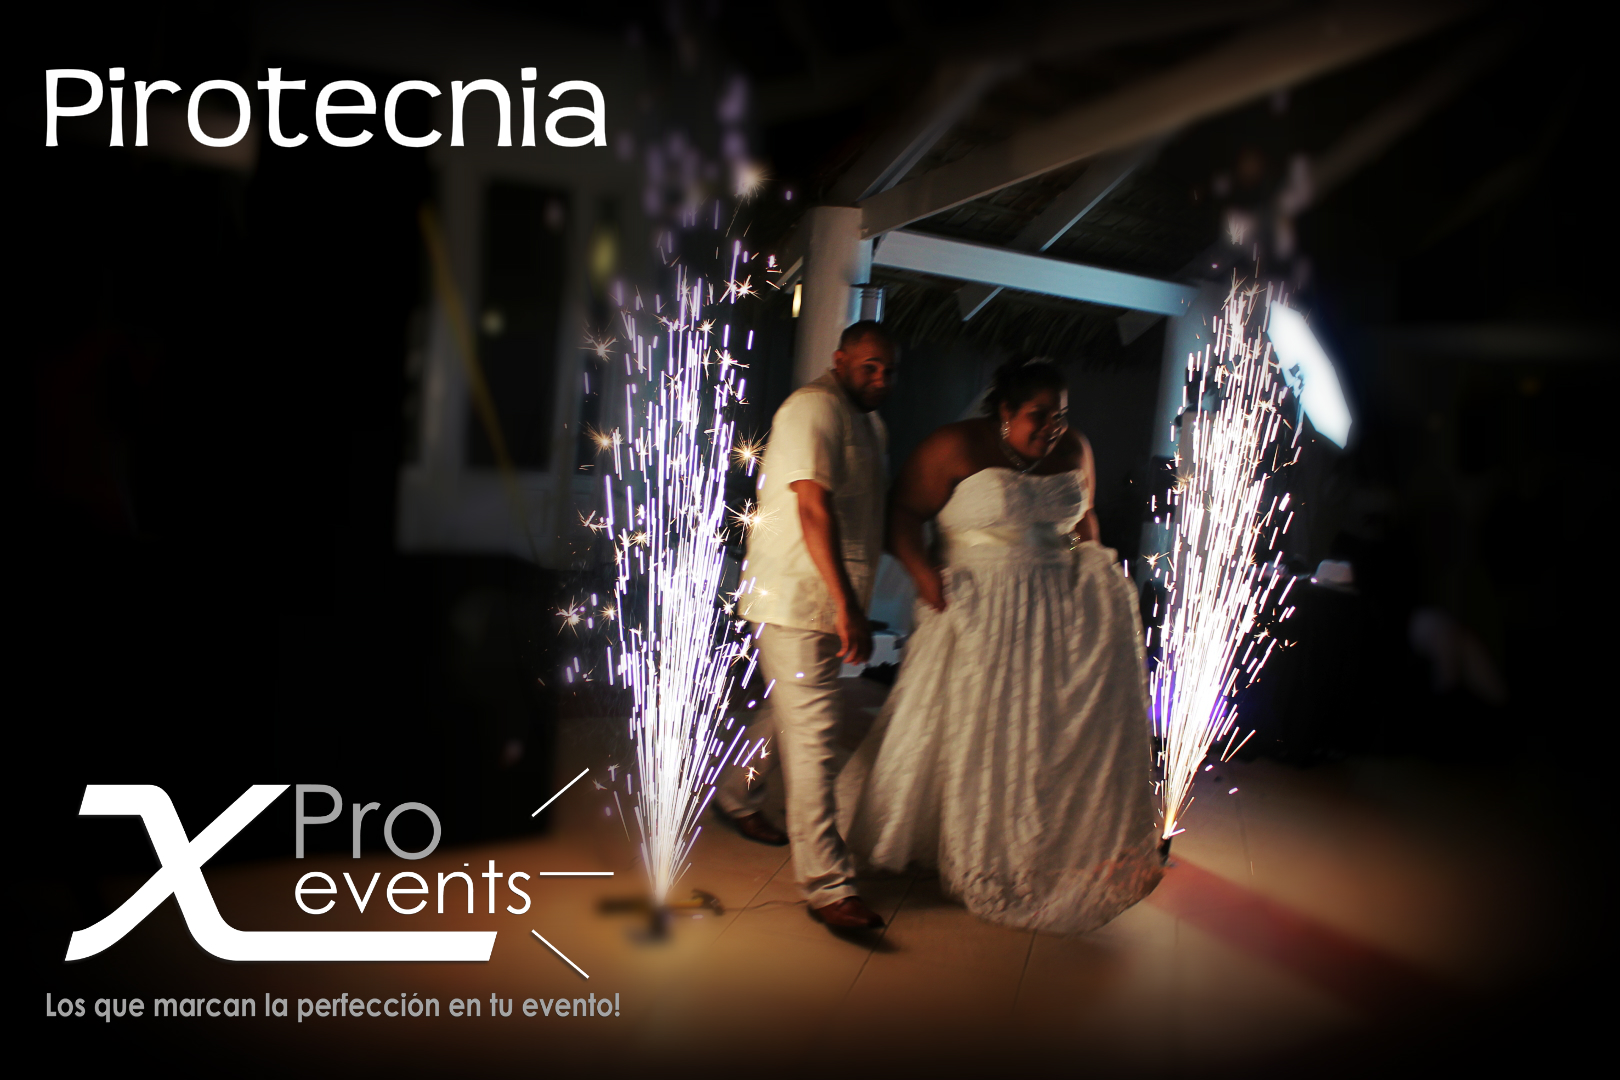 www.Xproevents.com - Pirotecnia con volcanes de chispa.JPG